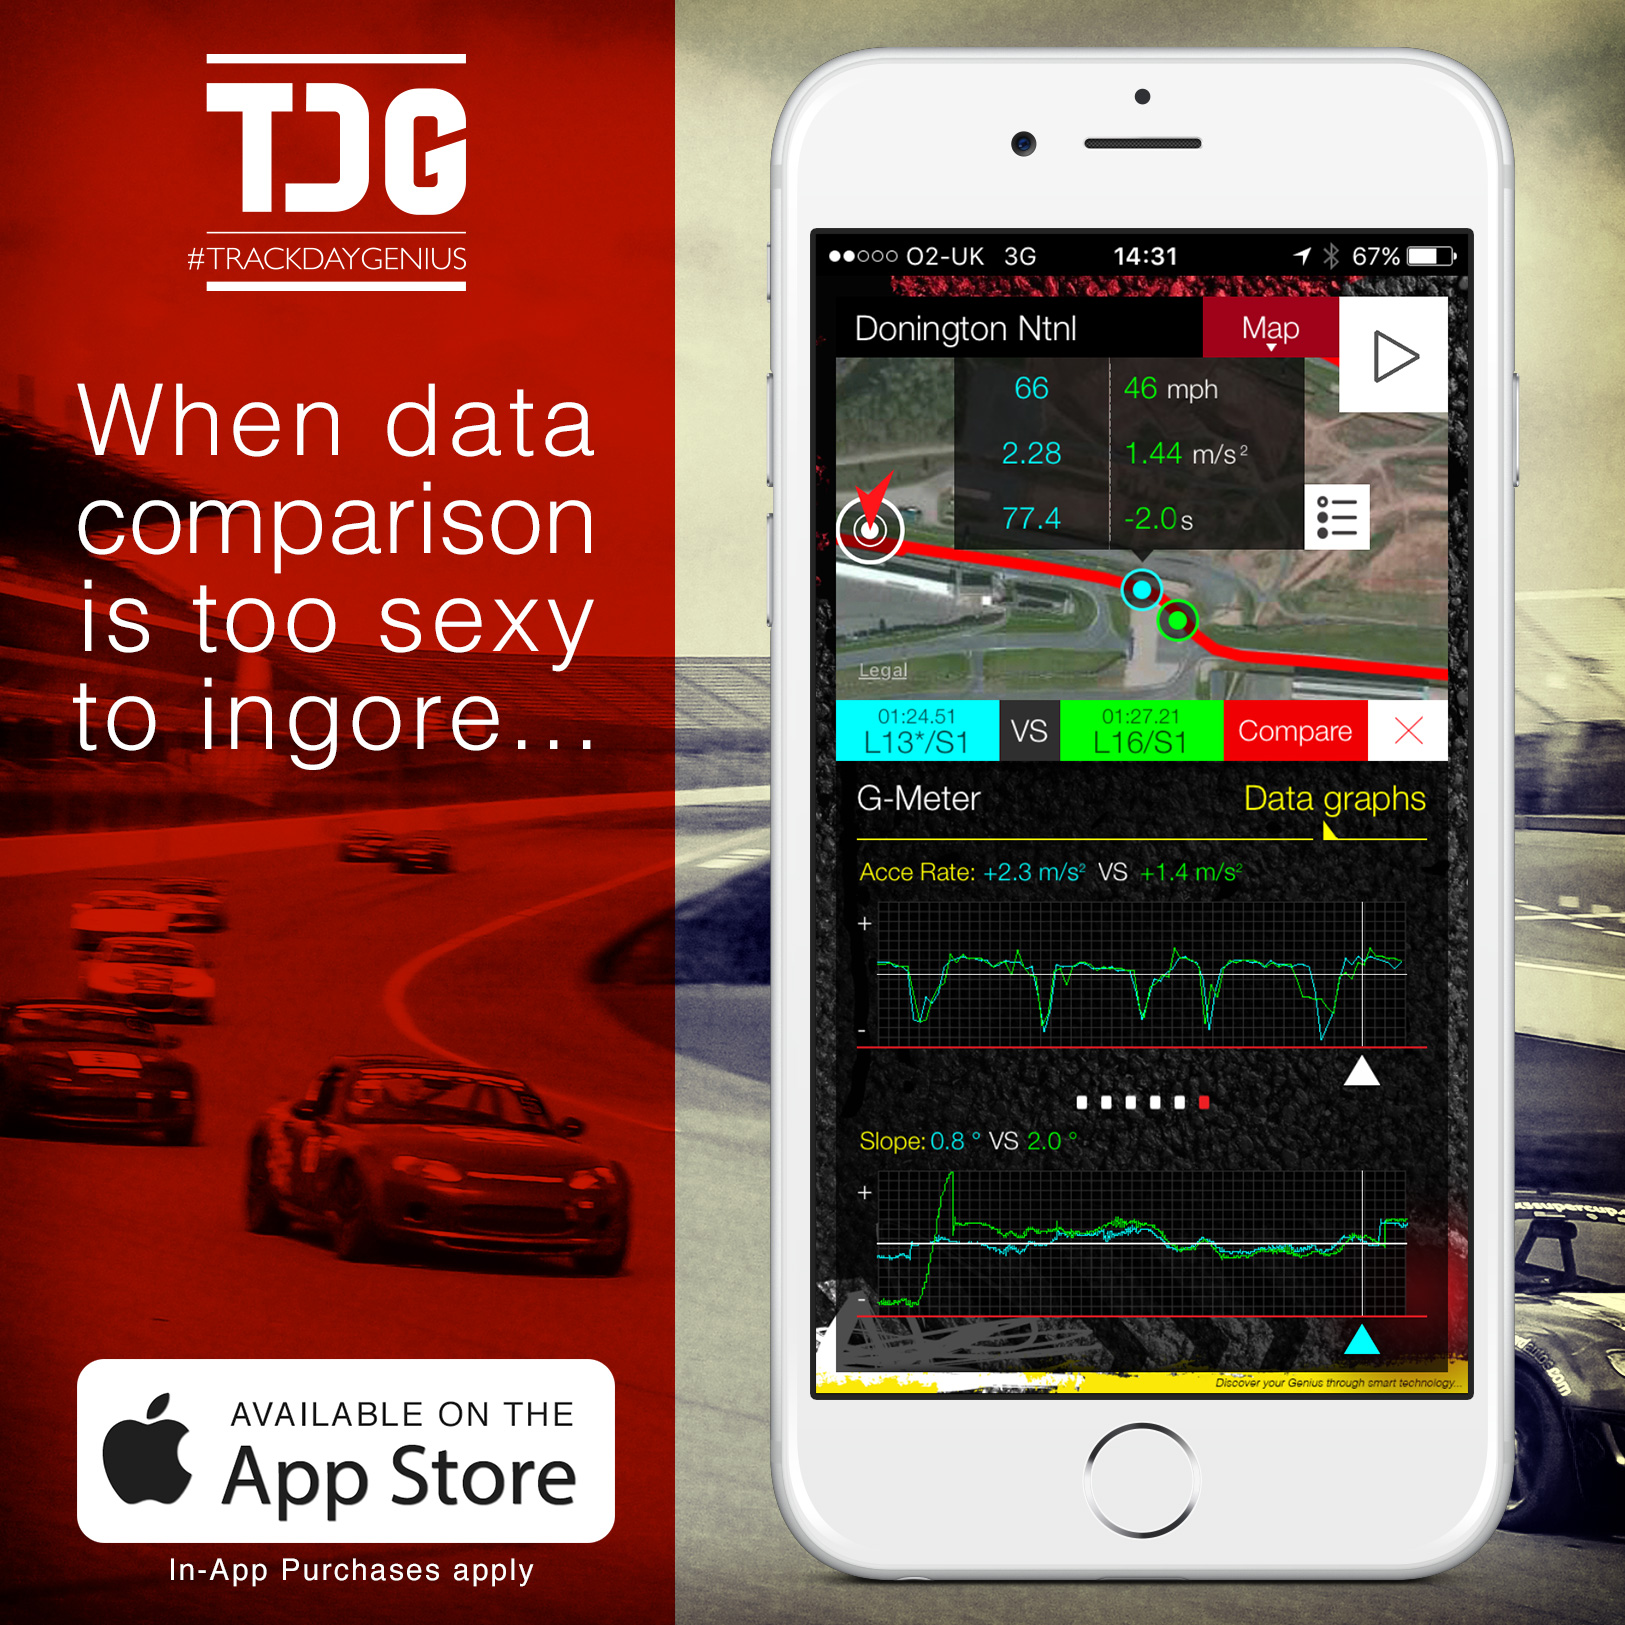 TDG-socialMediaPromos-dataComparison-sq